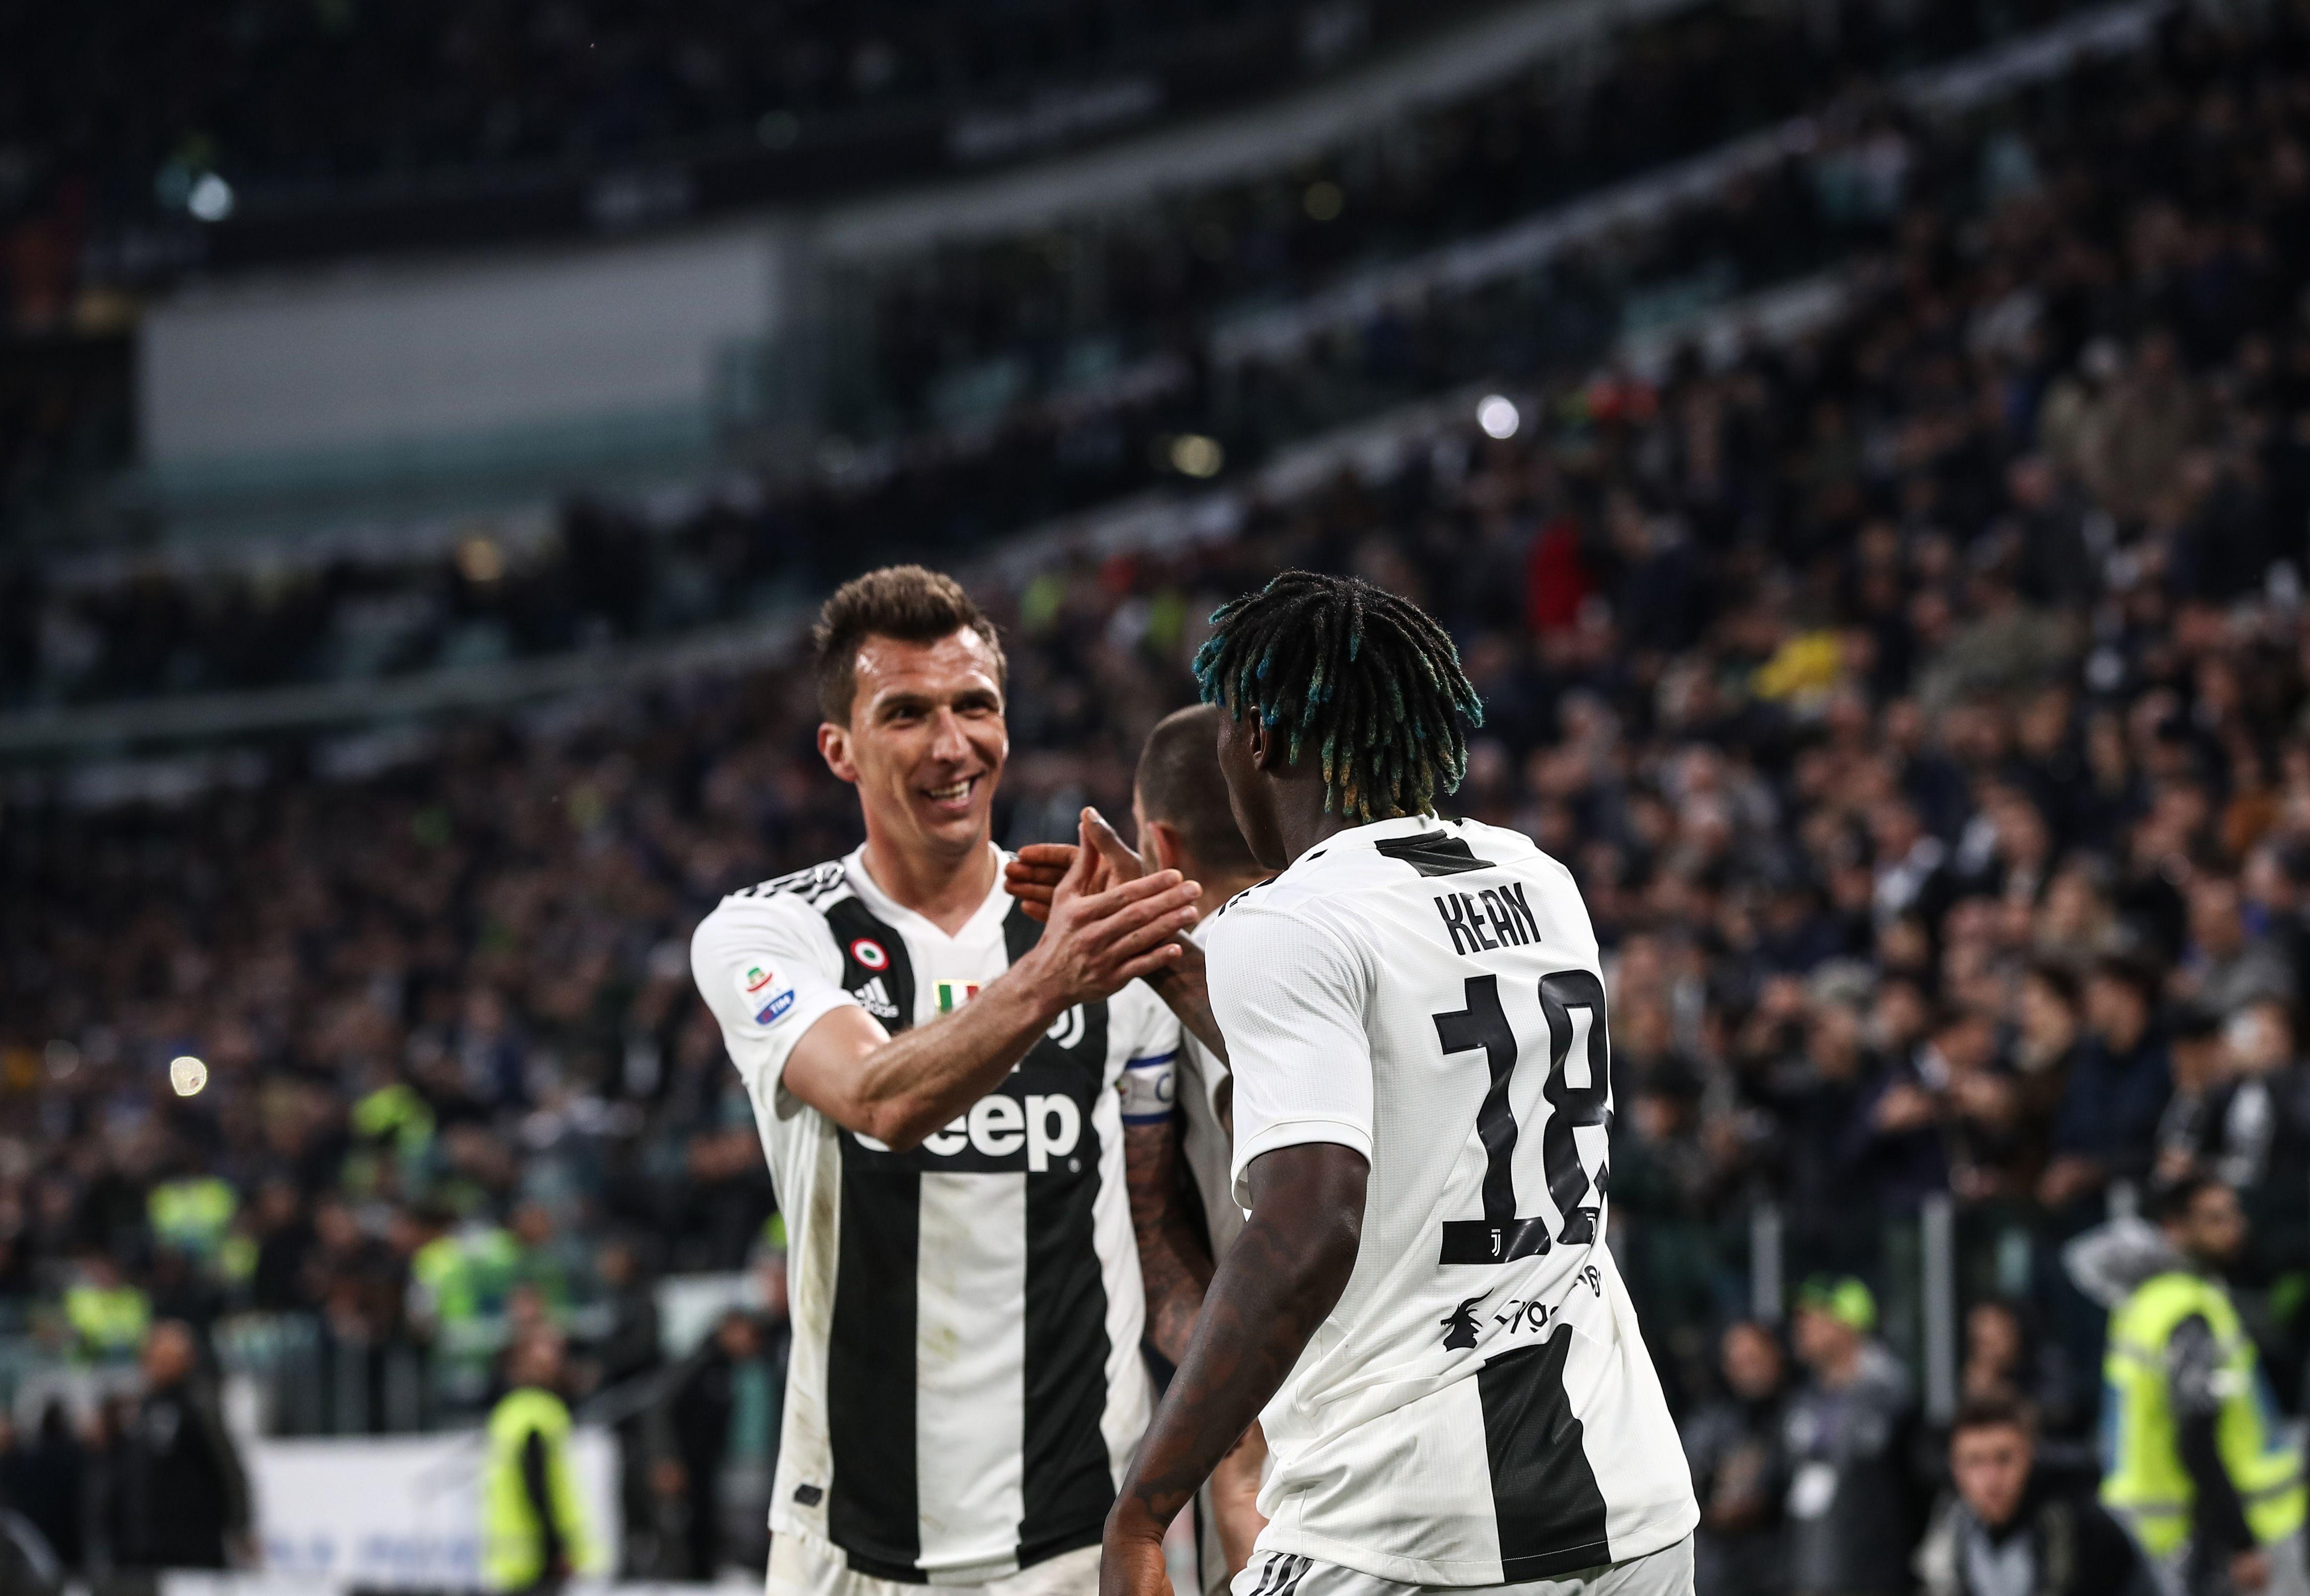 Matthijs de Ligt transfer to Juventus could have big effect on Everton